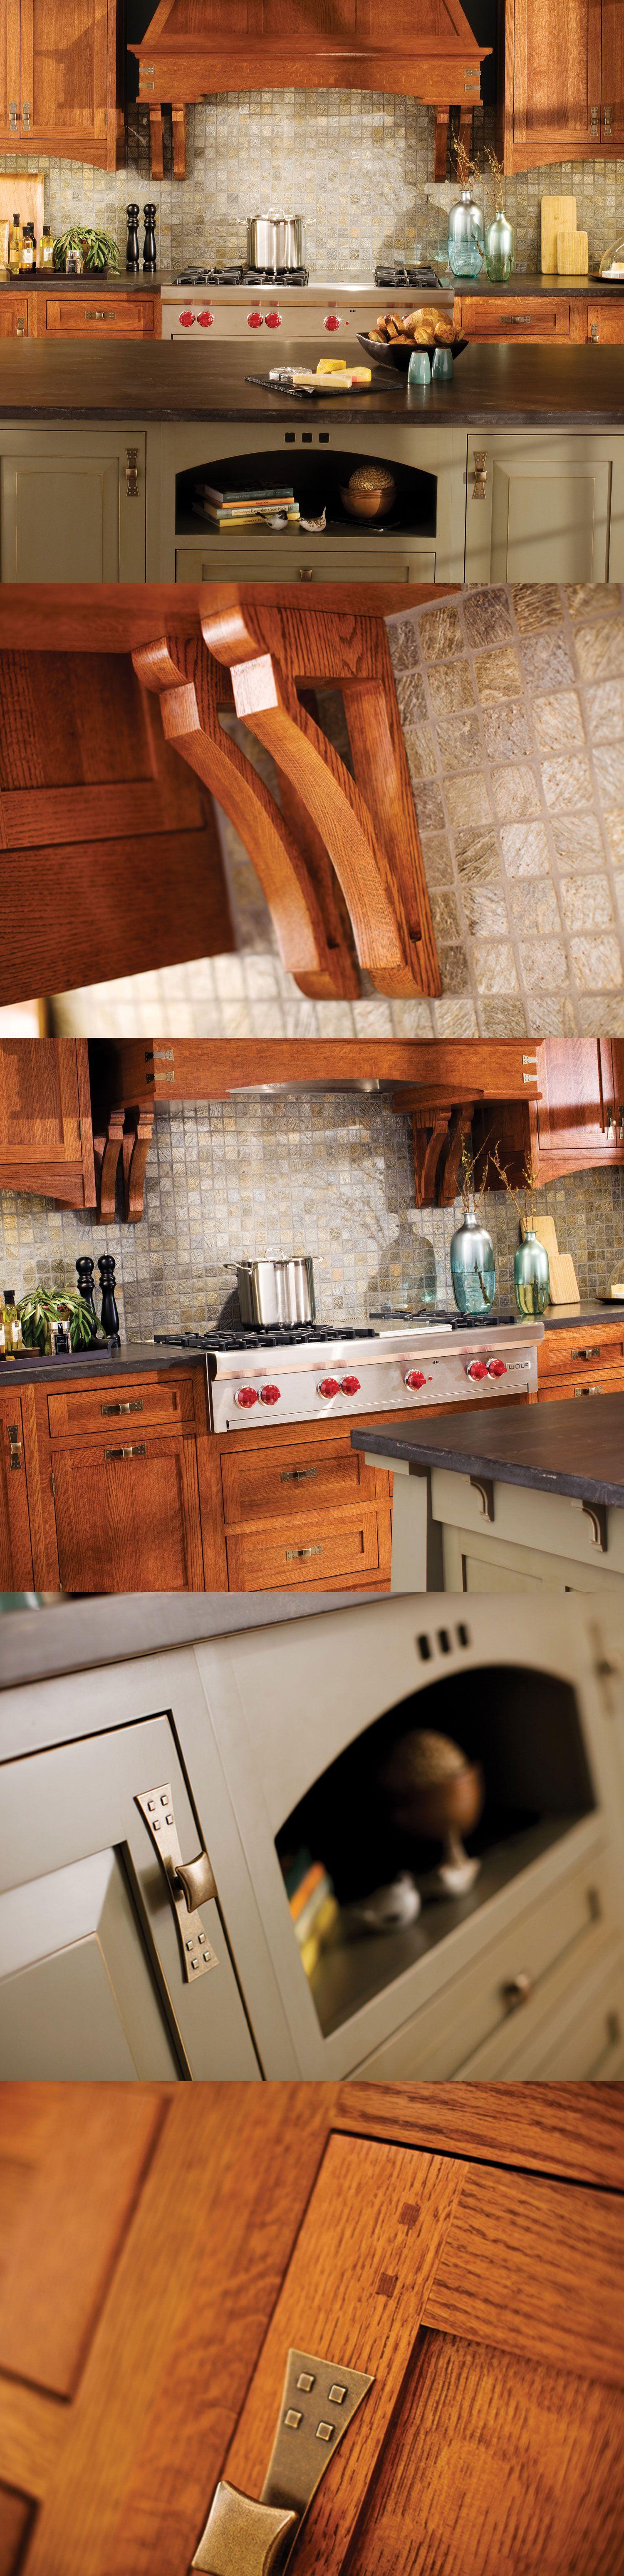 craftsman style kitchen hardware designers miami design in dura supreme cabinetry love